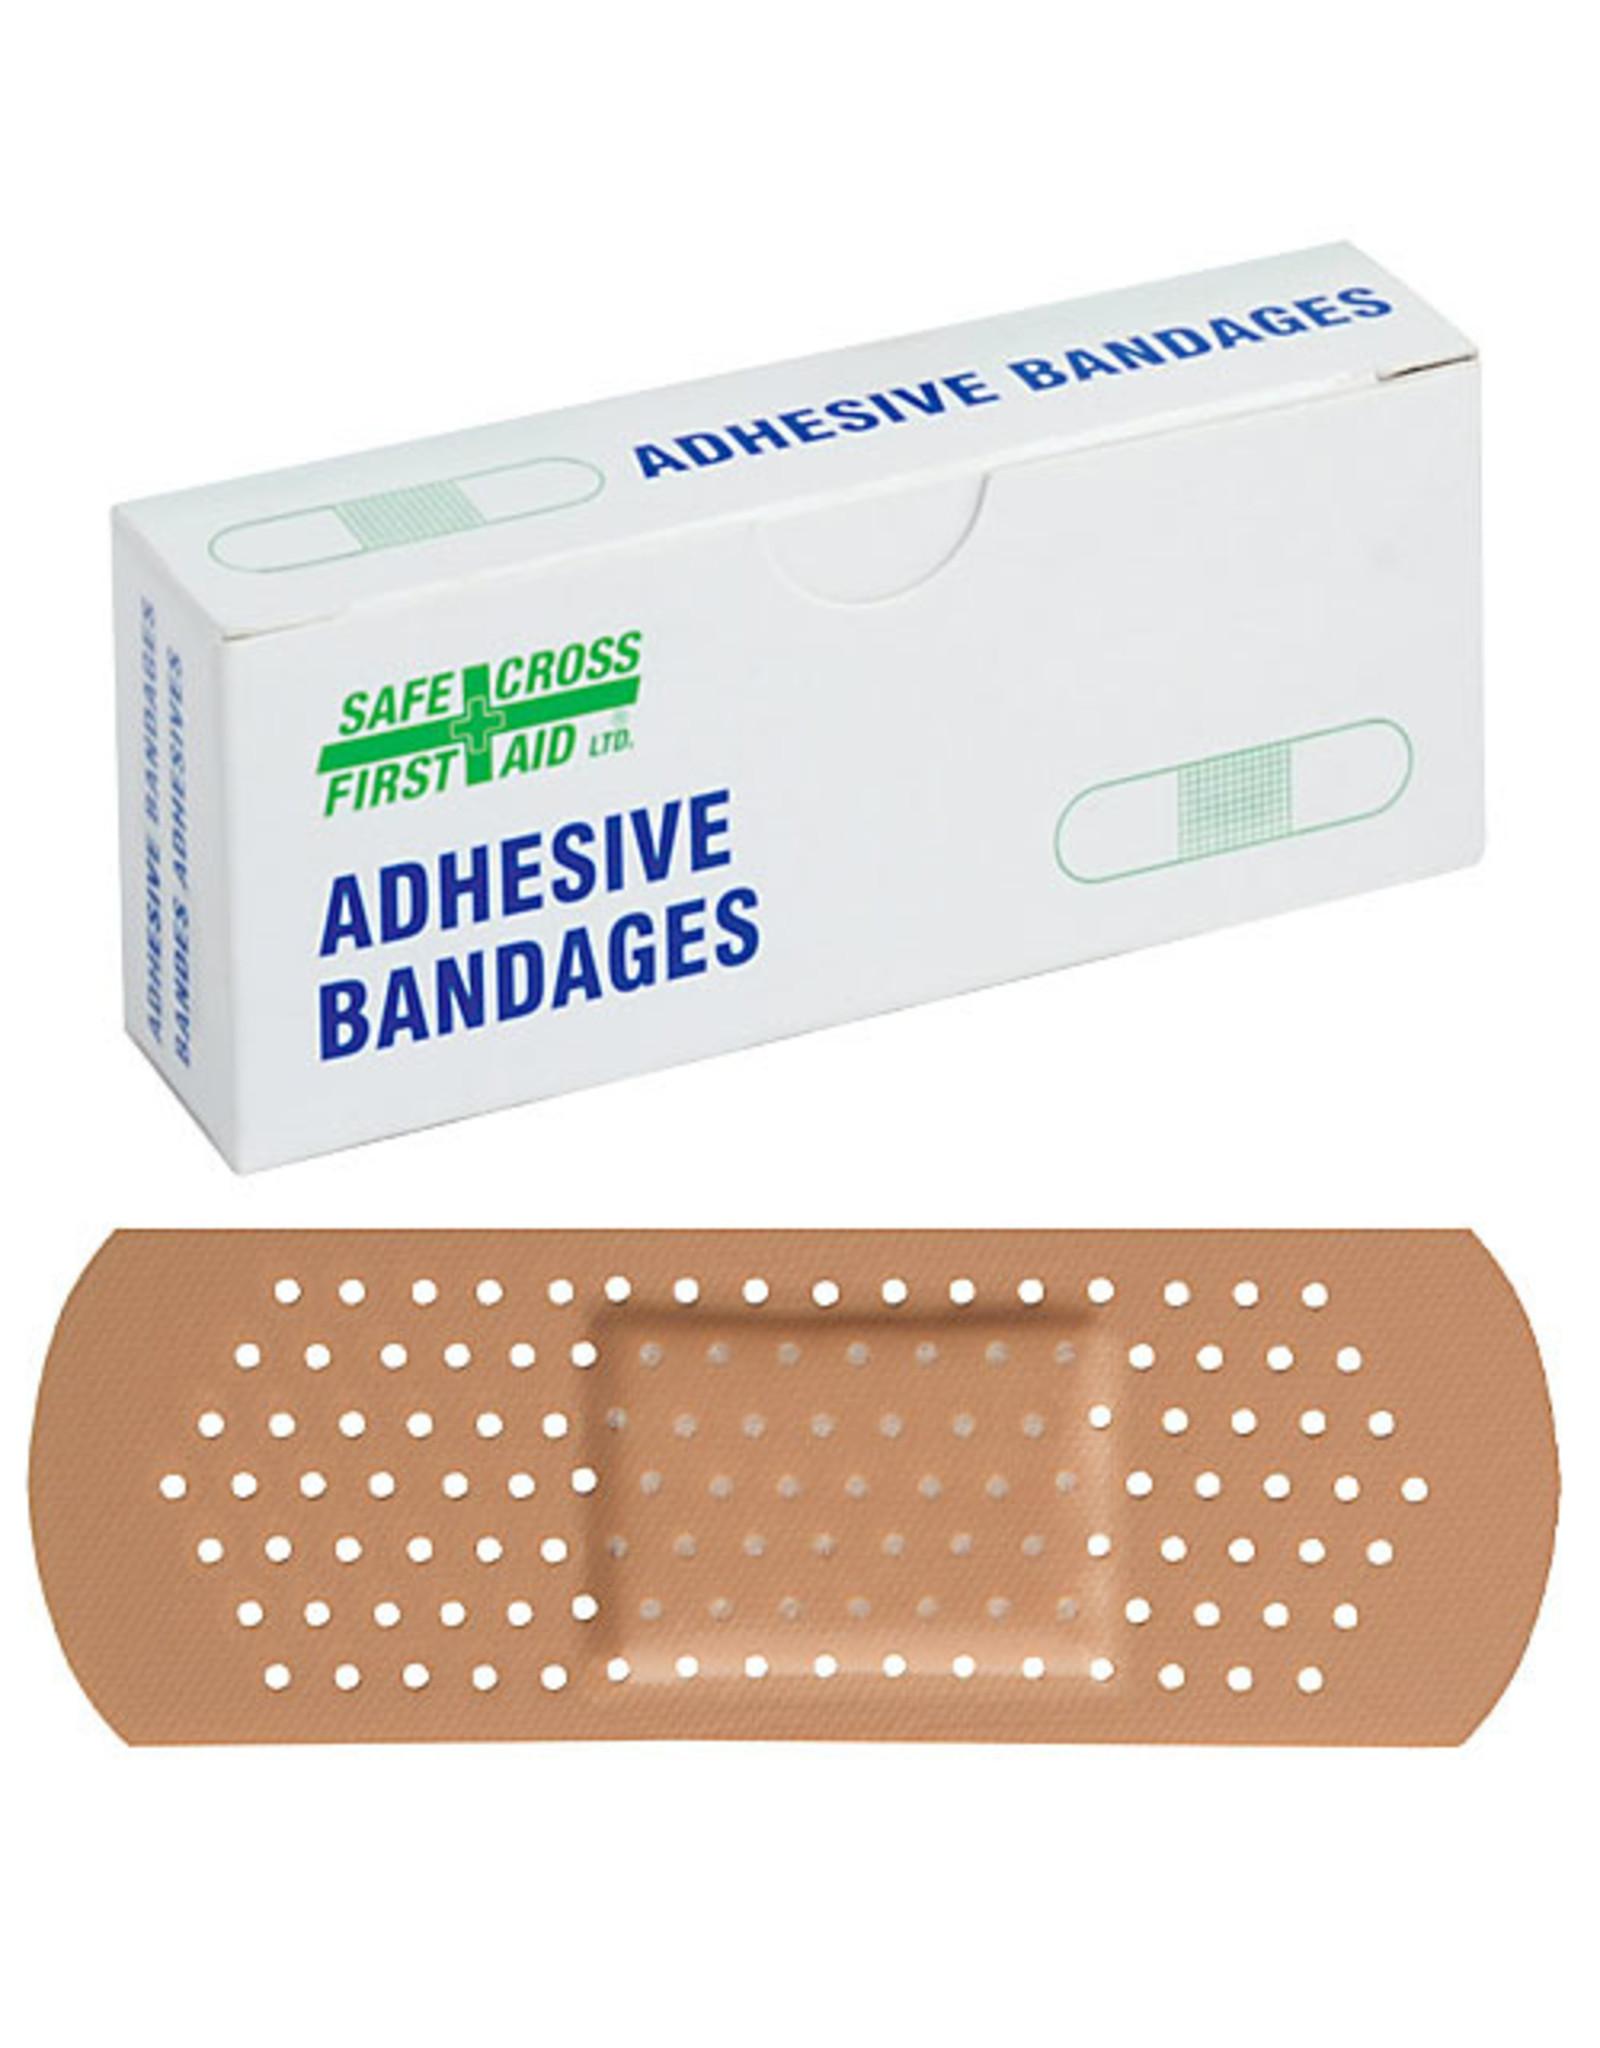 Plastic Bandages, 2.5 x 7.6 cm, 16/Unit Box